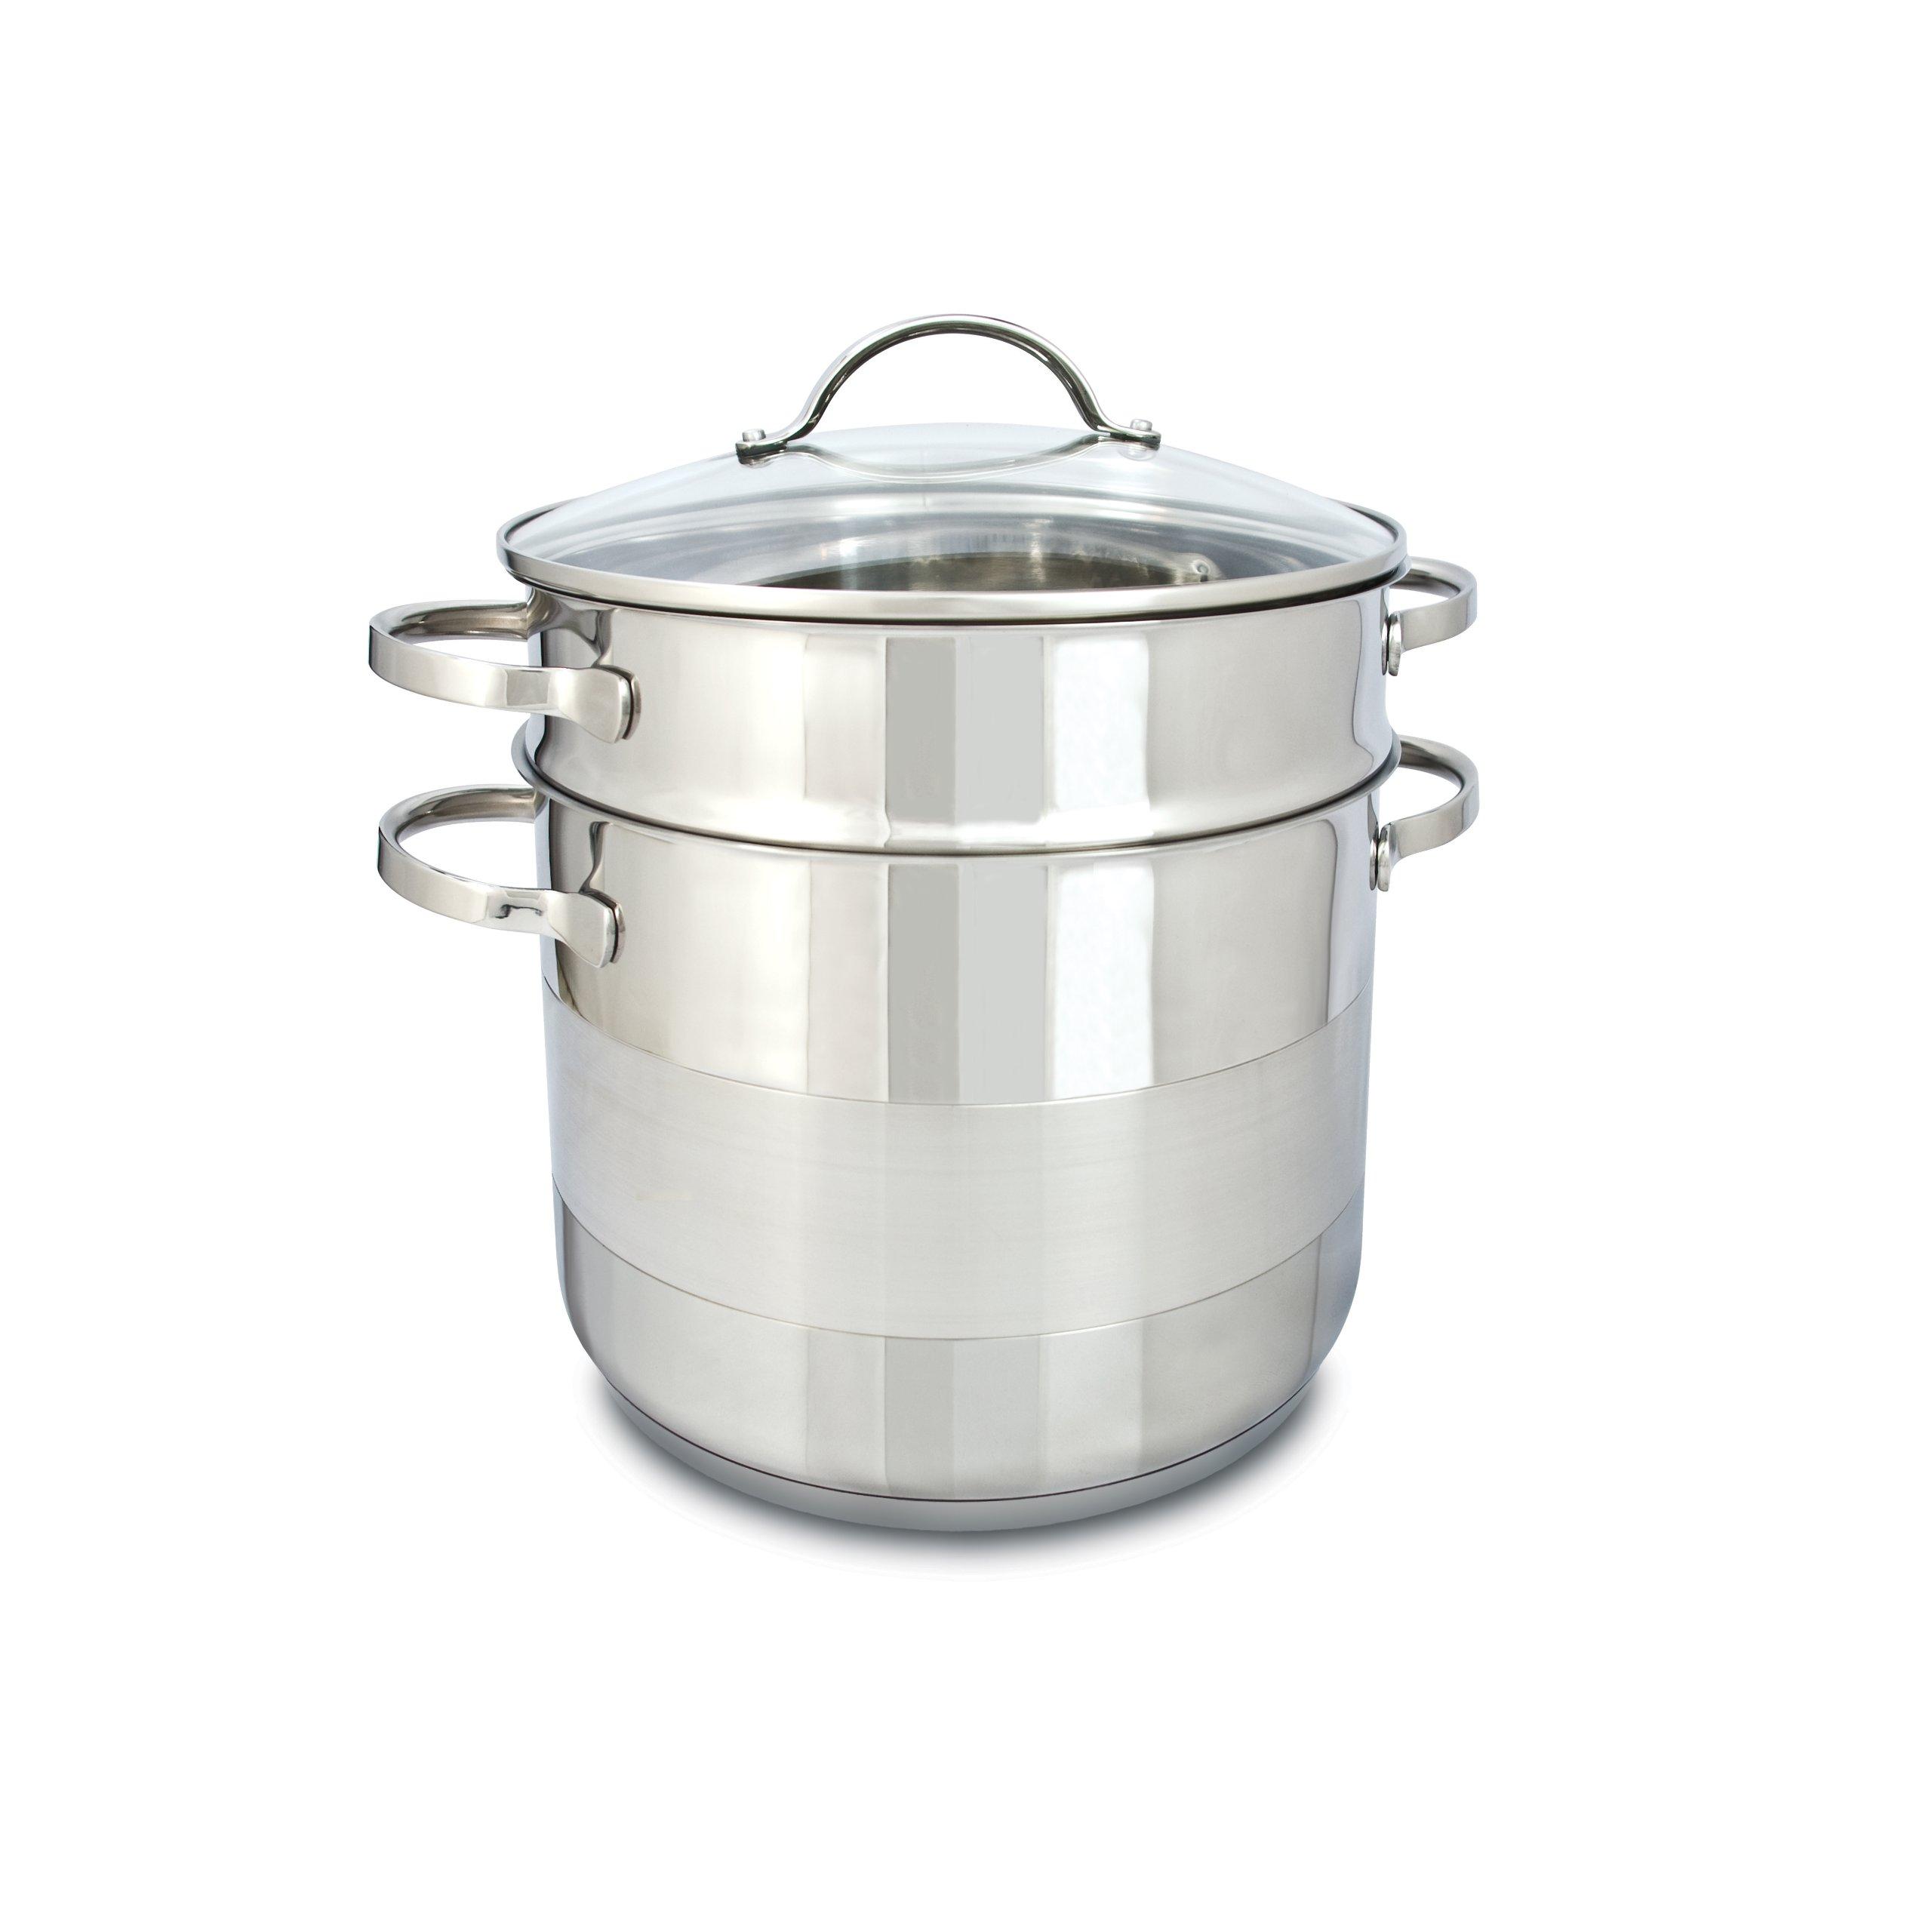 Cuisinox POT-C24-PASTA Gourmet Covered Pasta Pot Set, 7.5-Liter